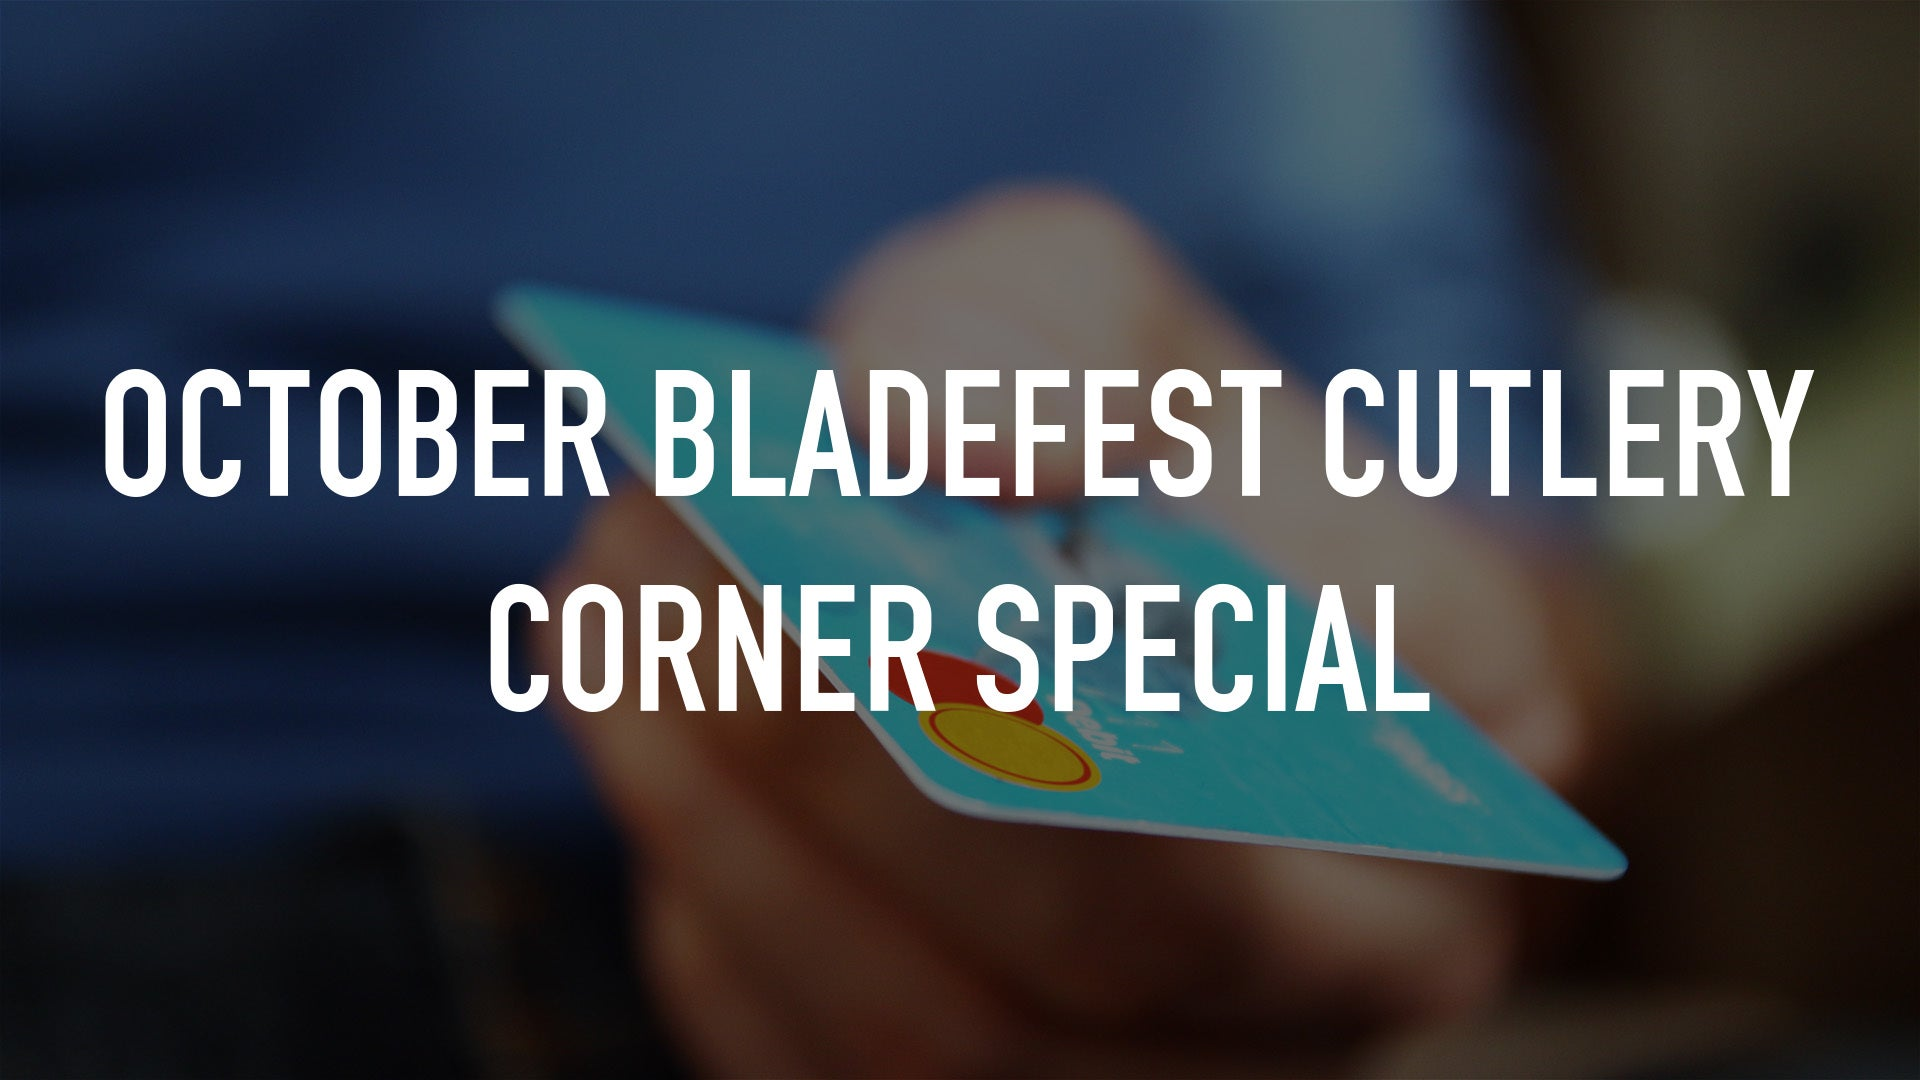 October Bladefest Cutlery Corner Special